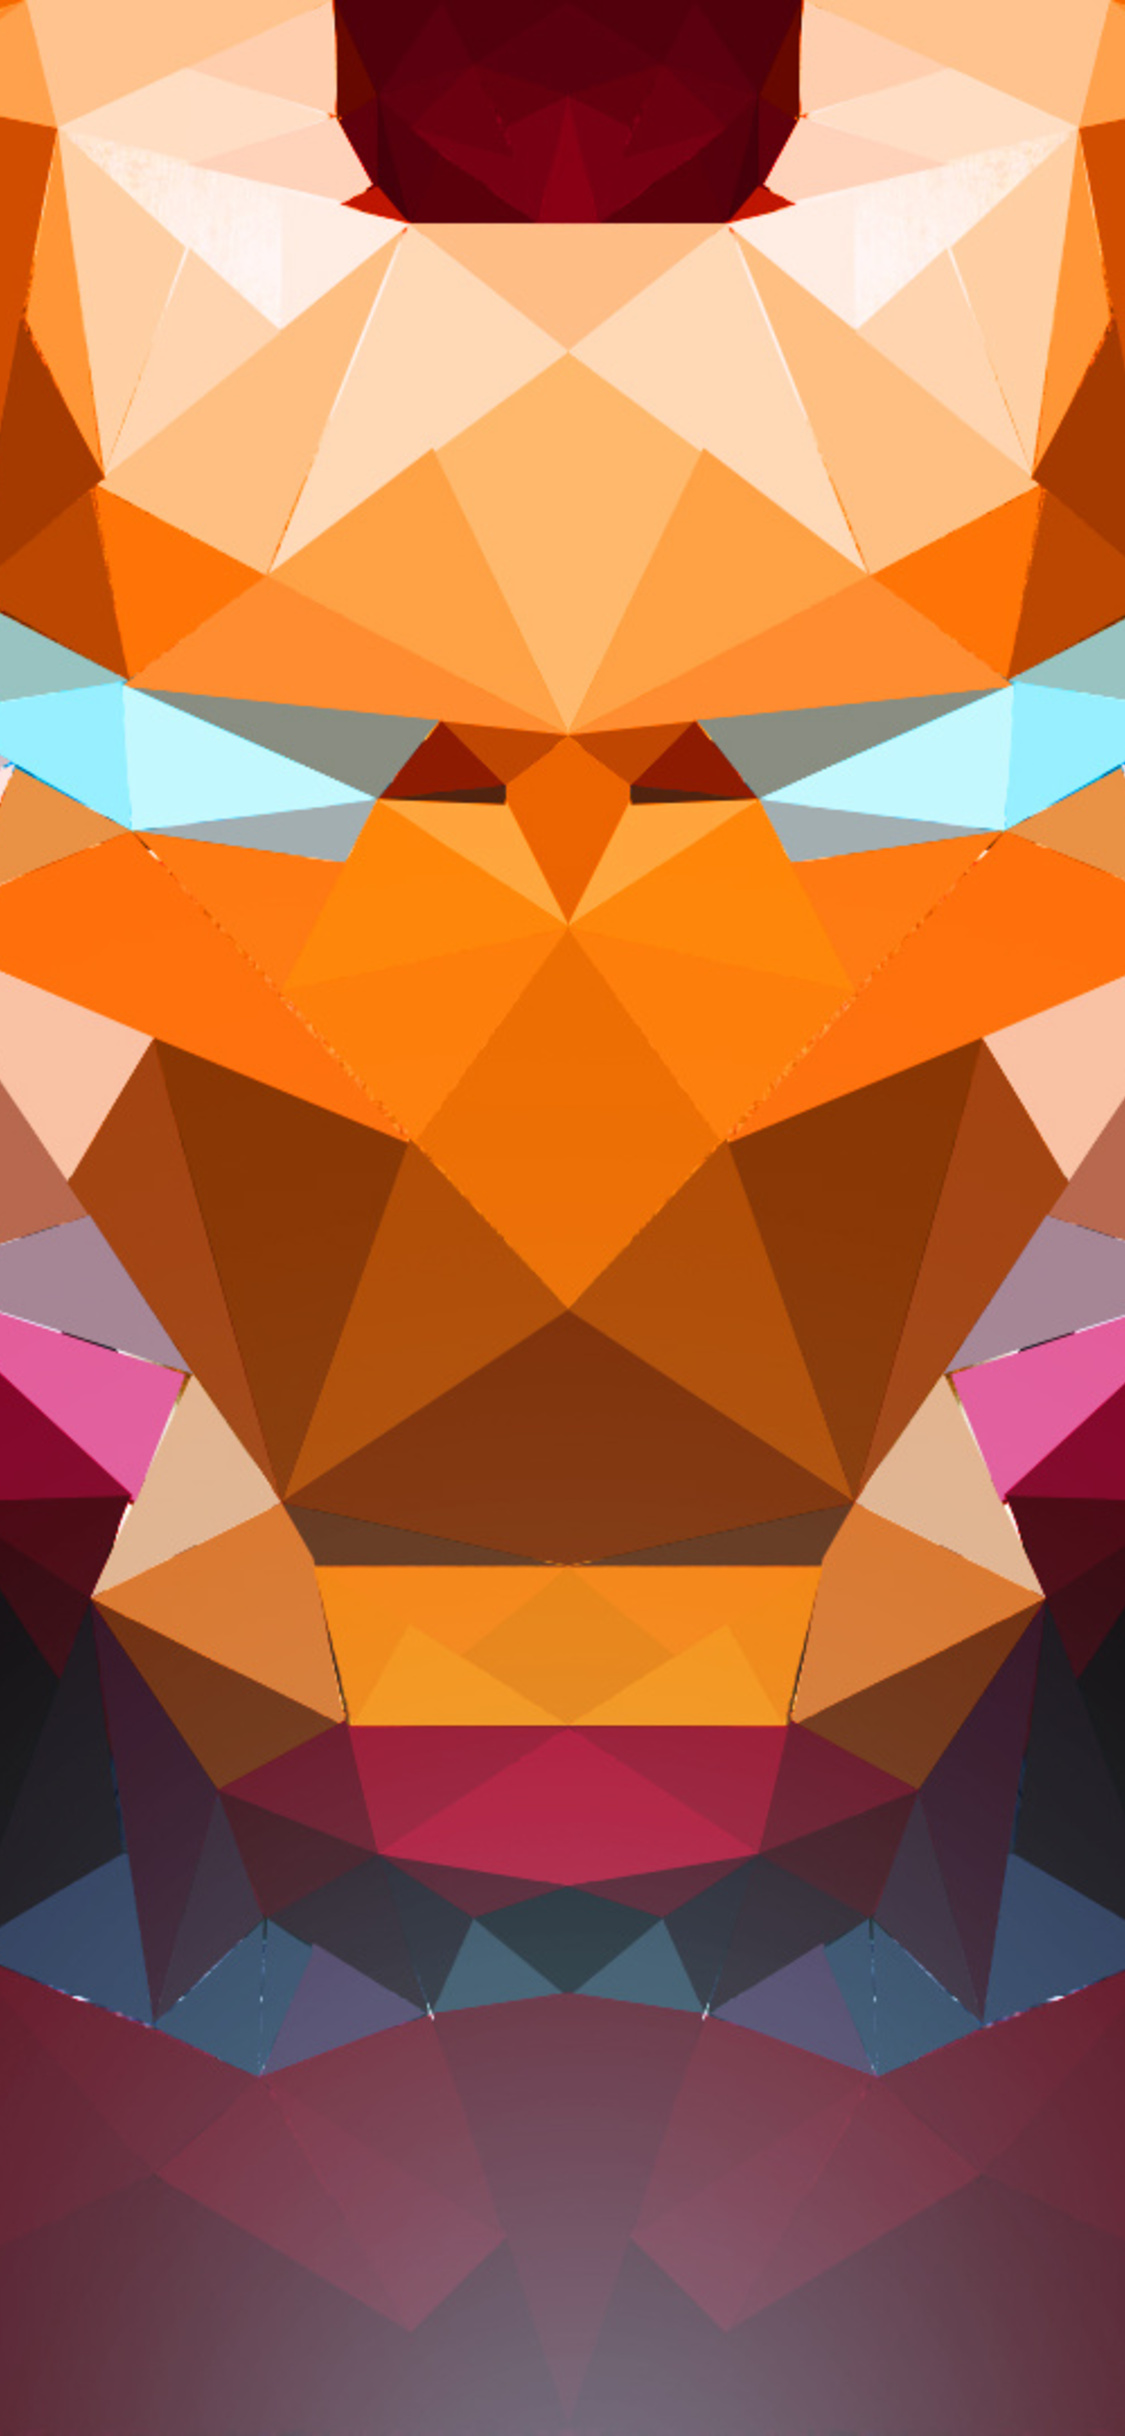 1125x2436 Iron Man Abstract Art Iphone Xs Iphone 10 Iphone X Hd 4k